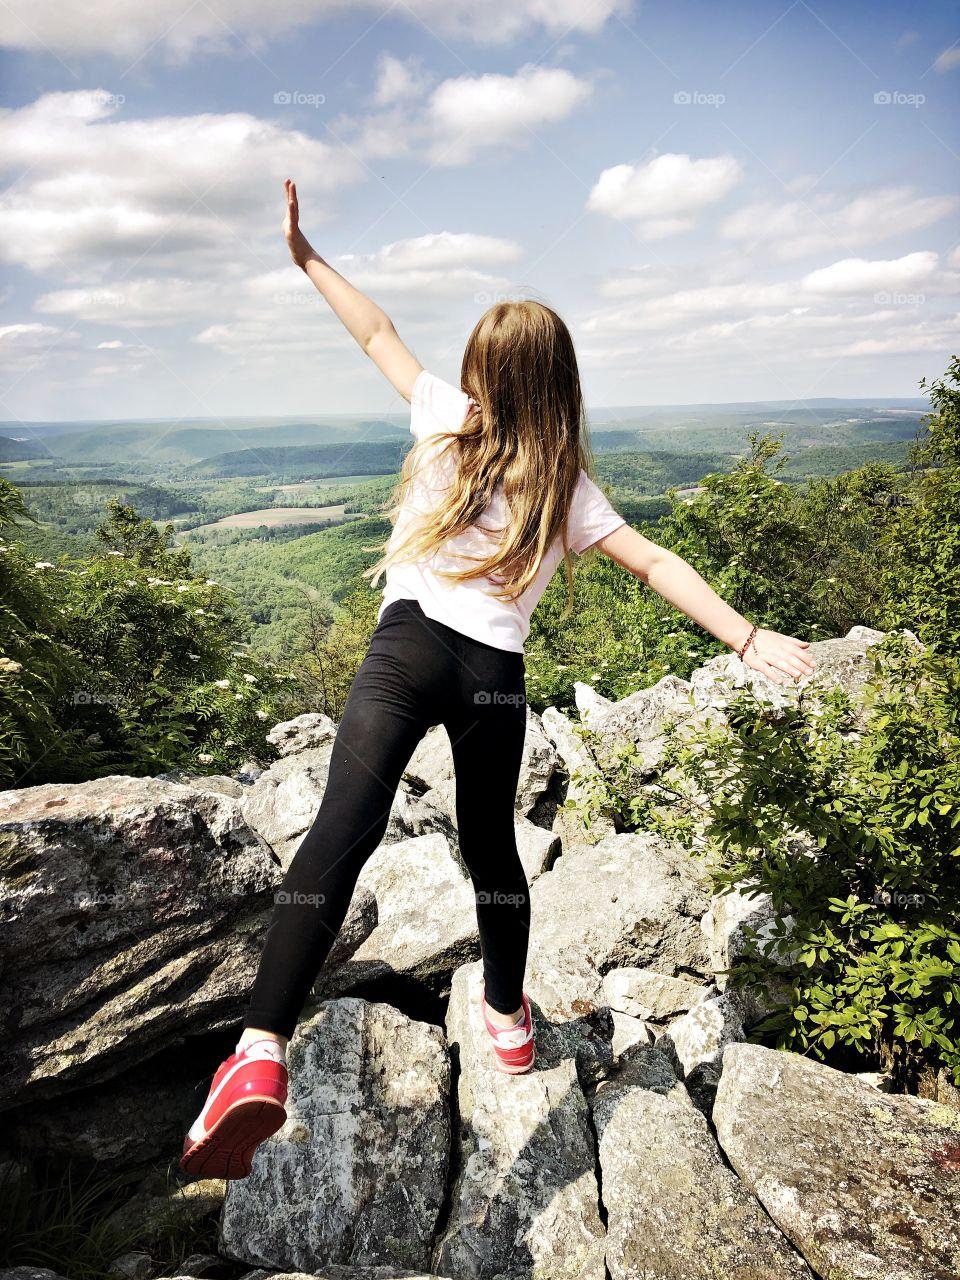 Hike to the top of Hawk Mountain, Pennsylvania.